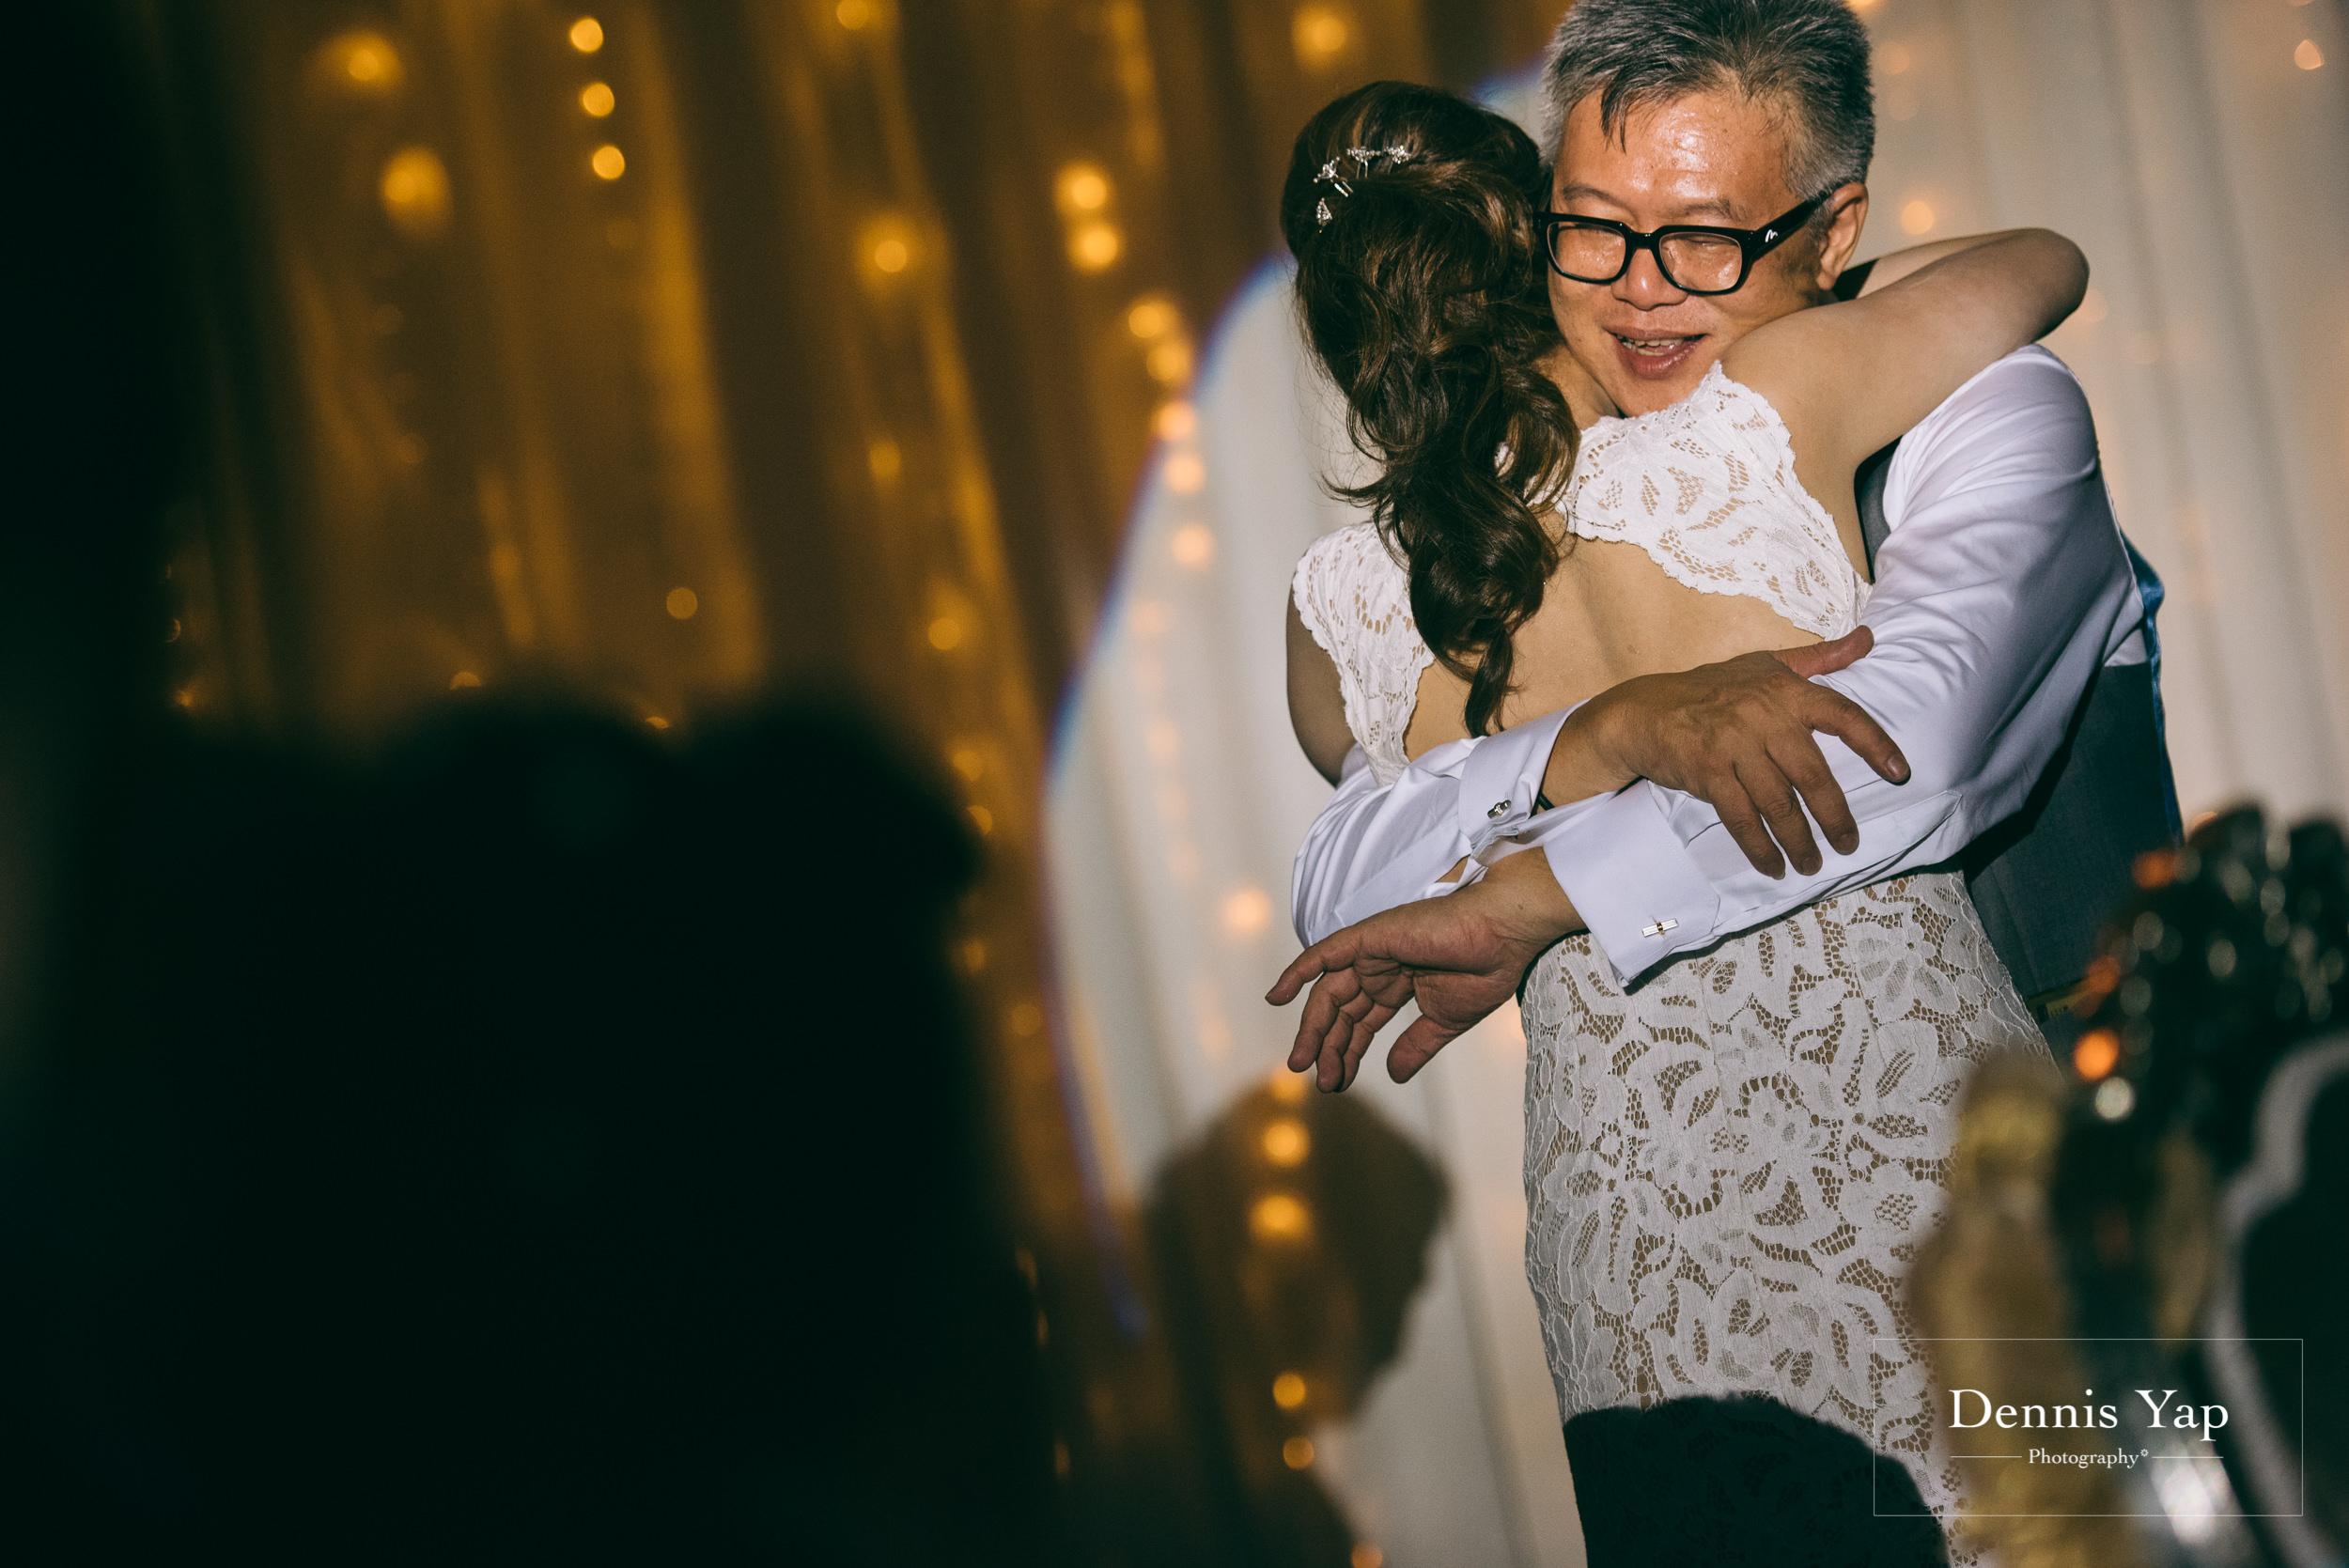 jordan amanda wedding day westin hotel kuala lumpur choe family dennis yap photography-35.jpg